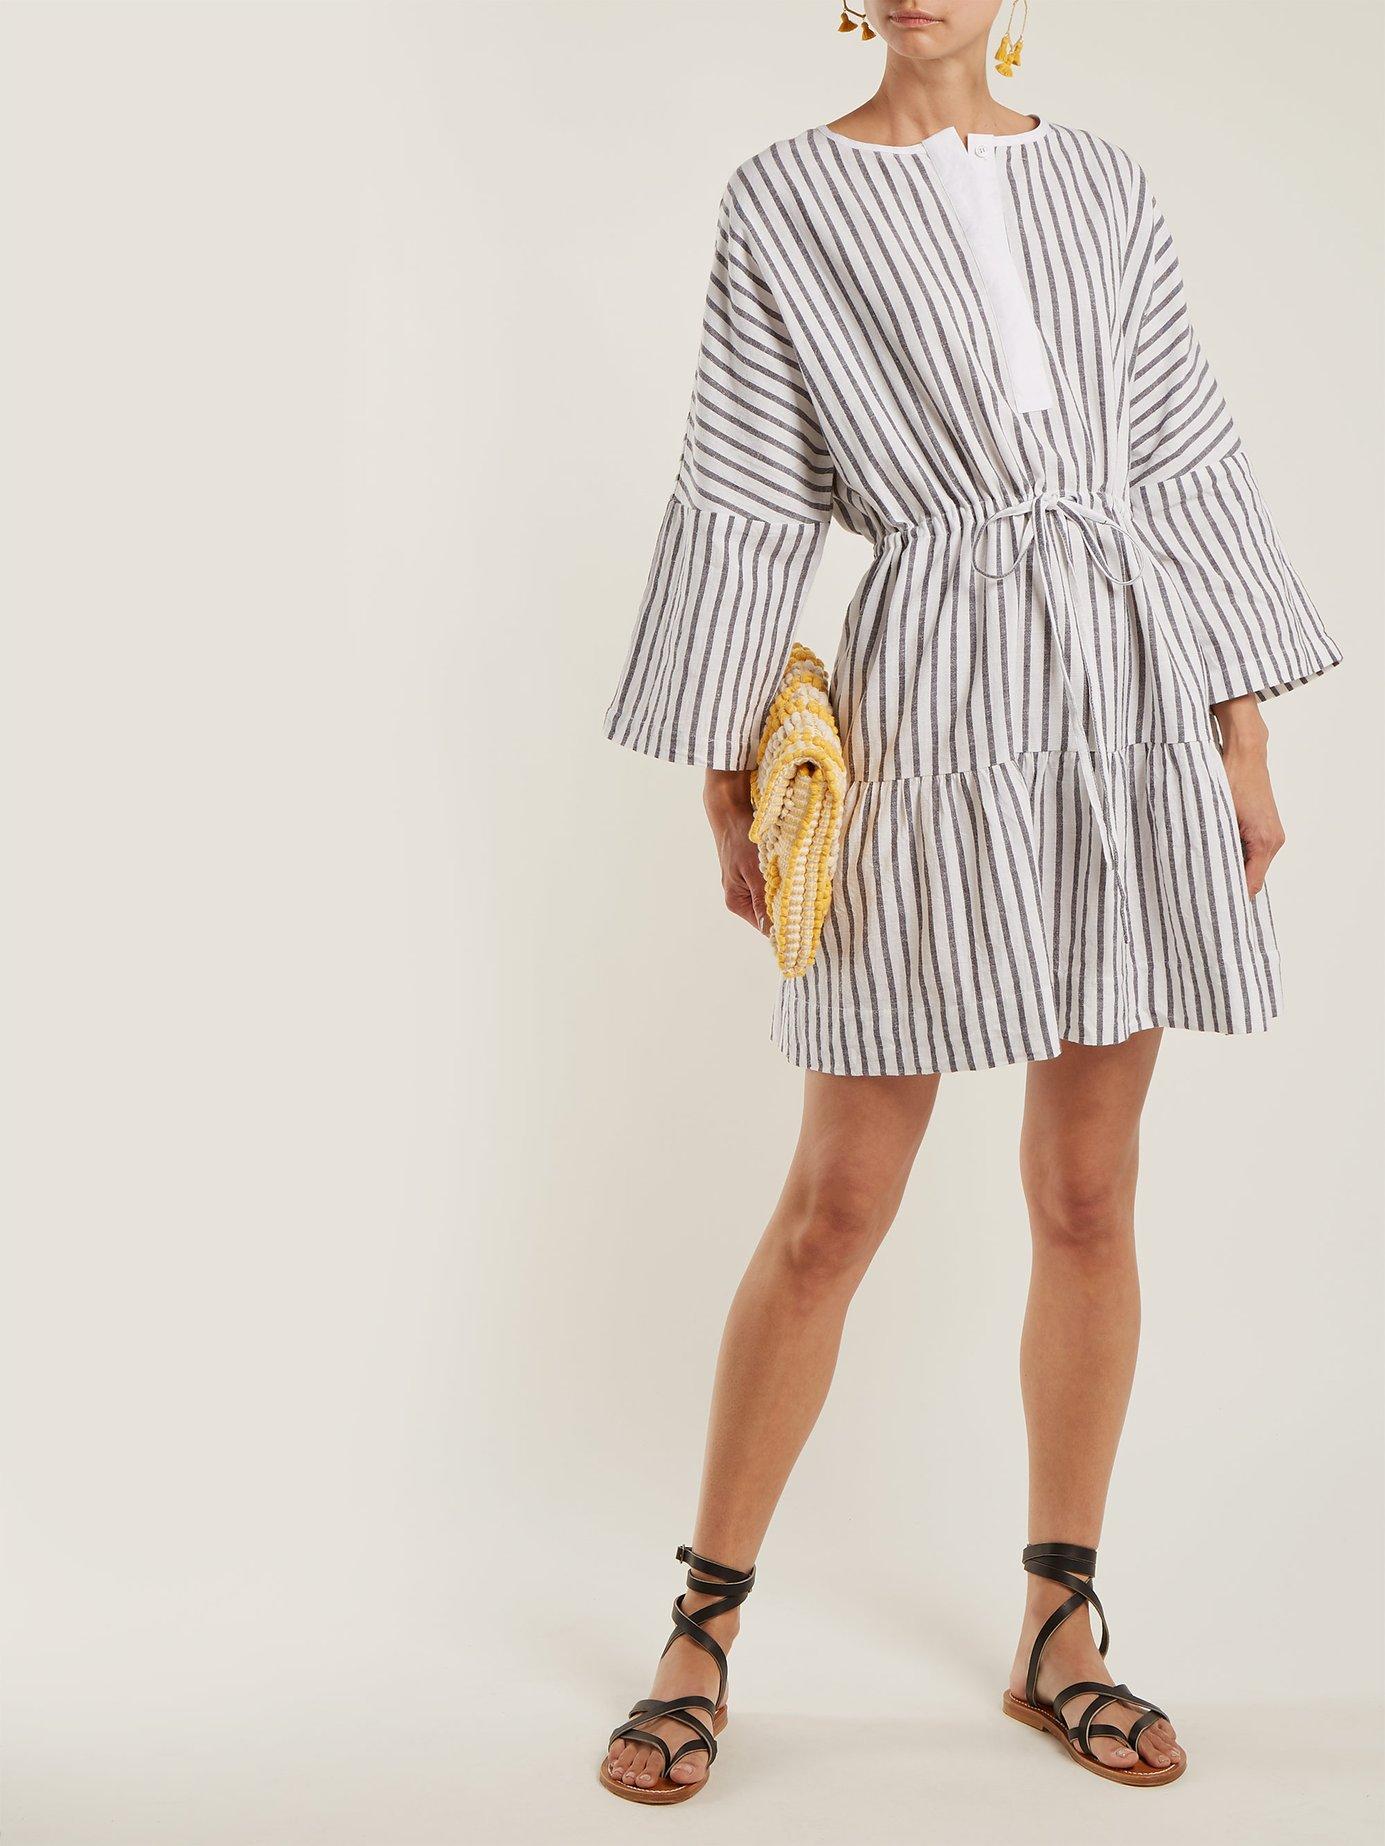 Drawstring cotton-flax mini dress by Wiggy Kit